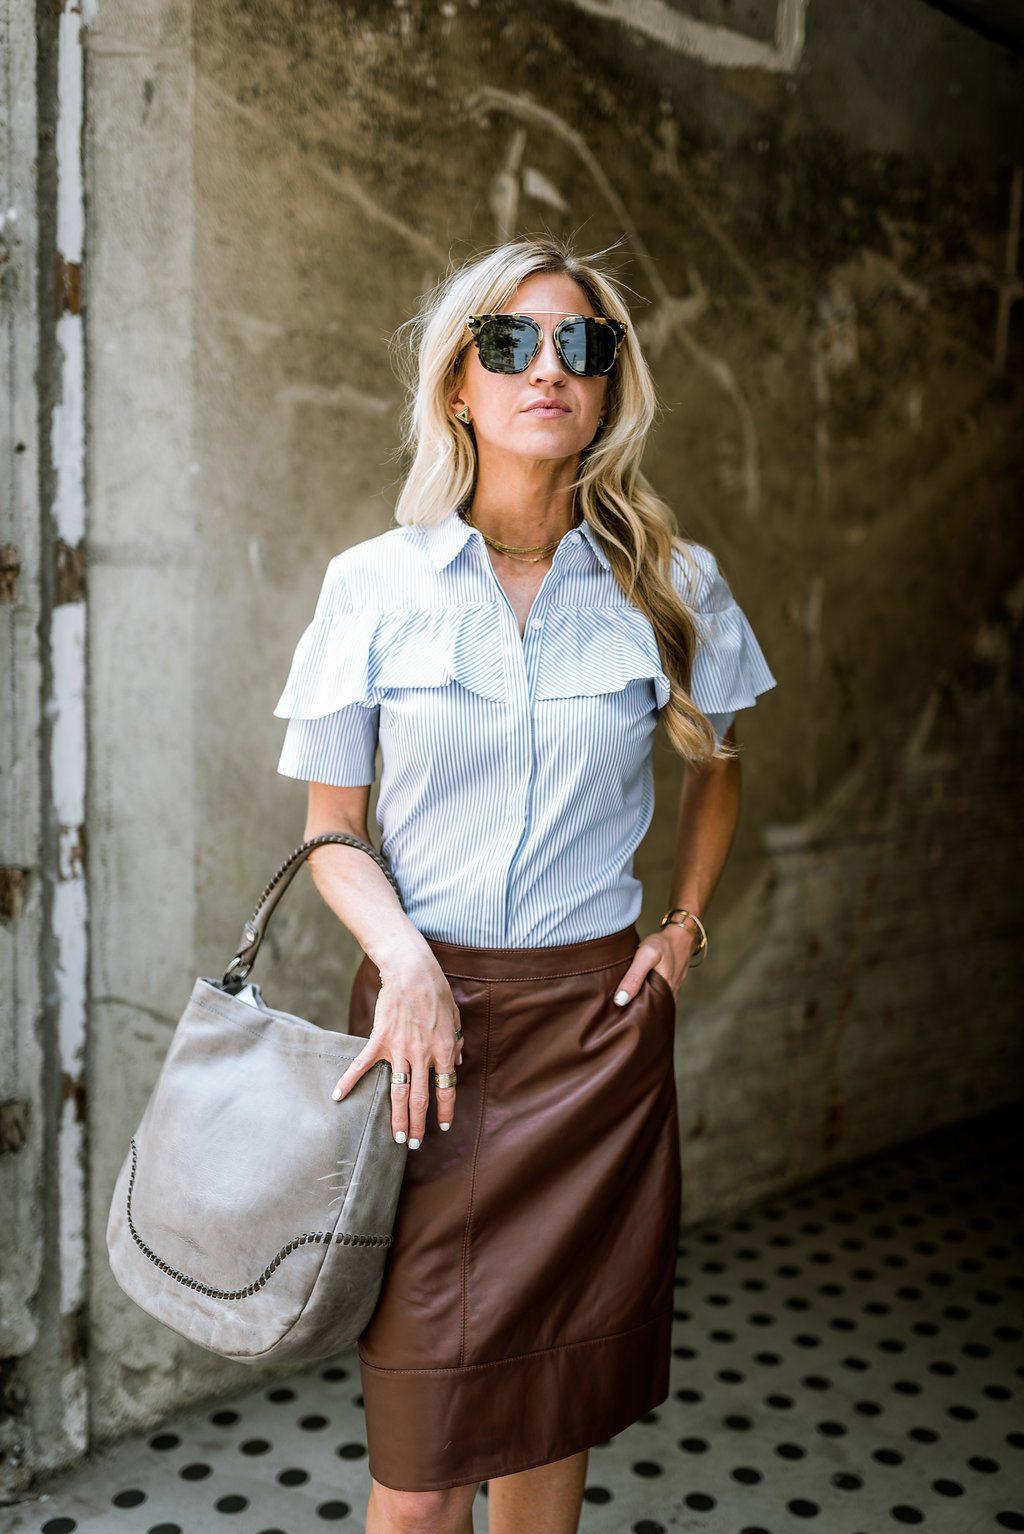 Light blue ruffle top + brown leather skirt